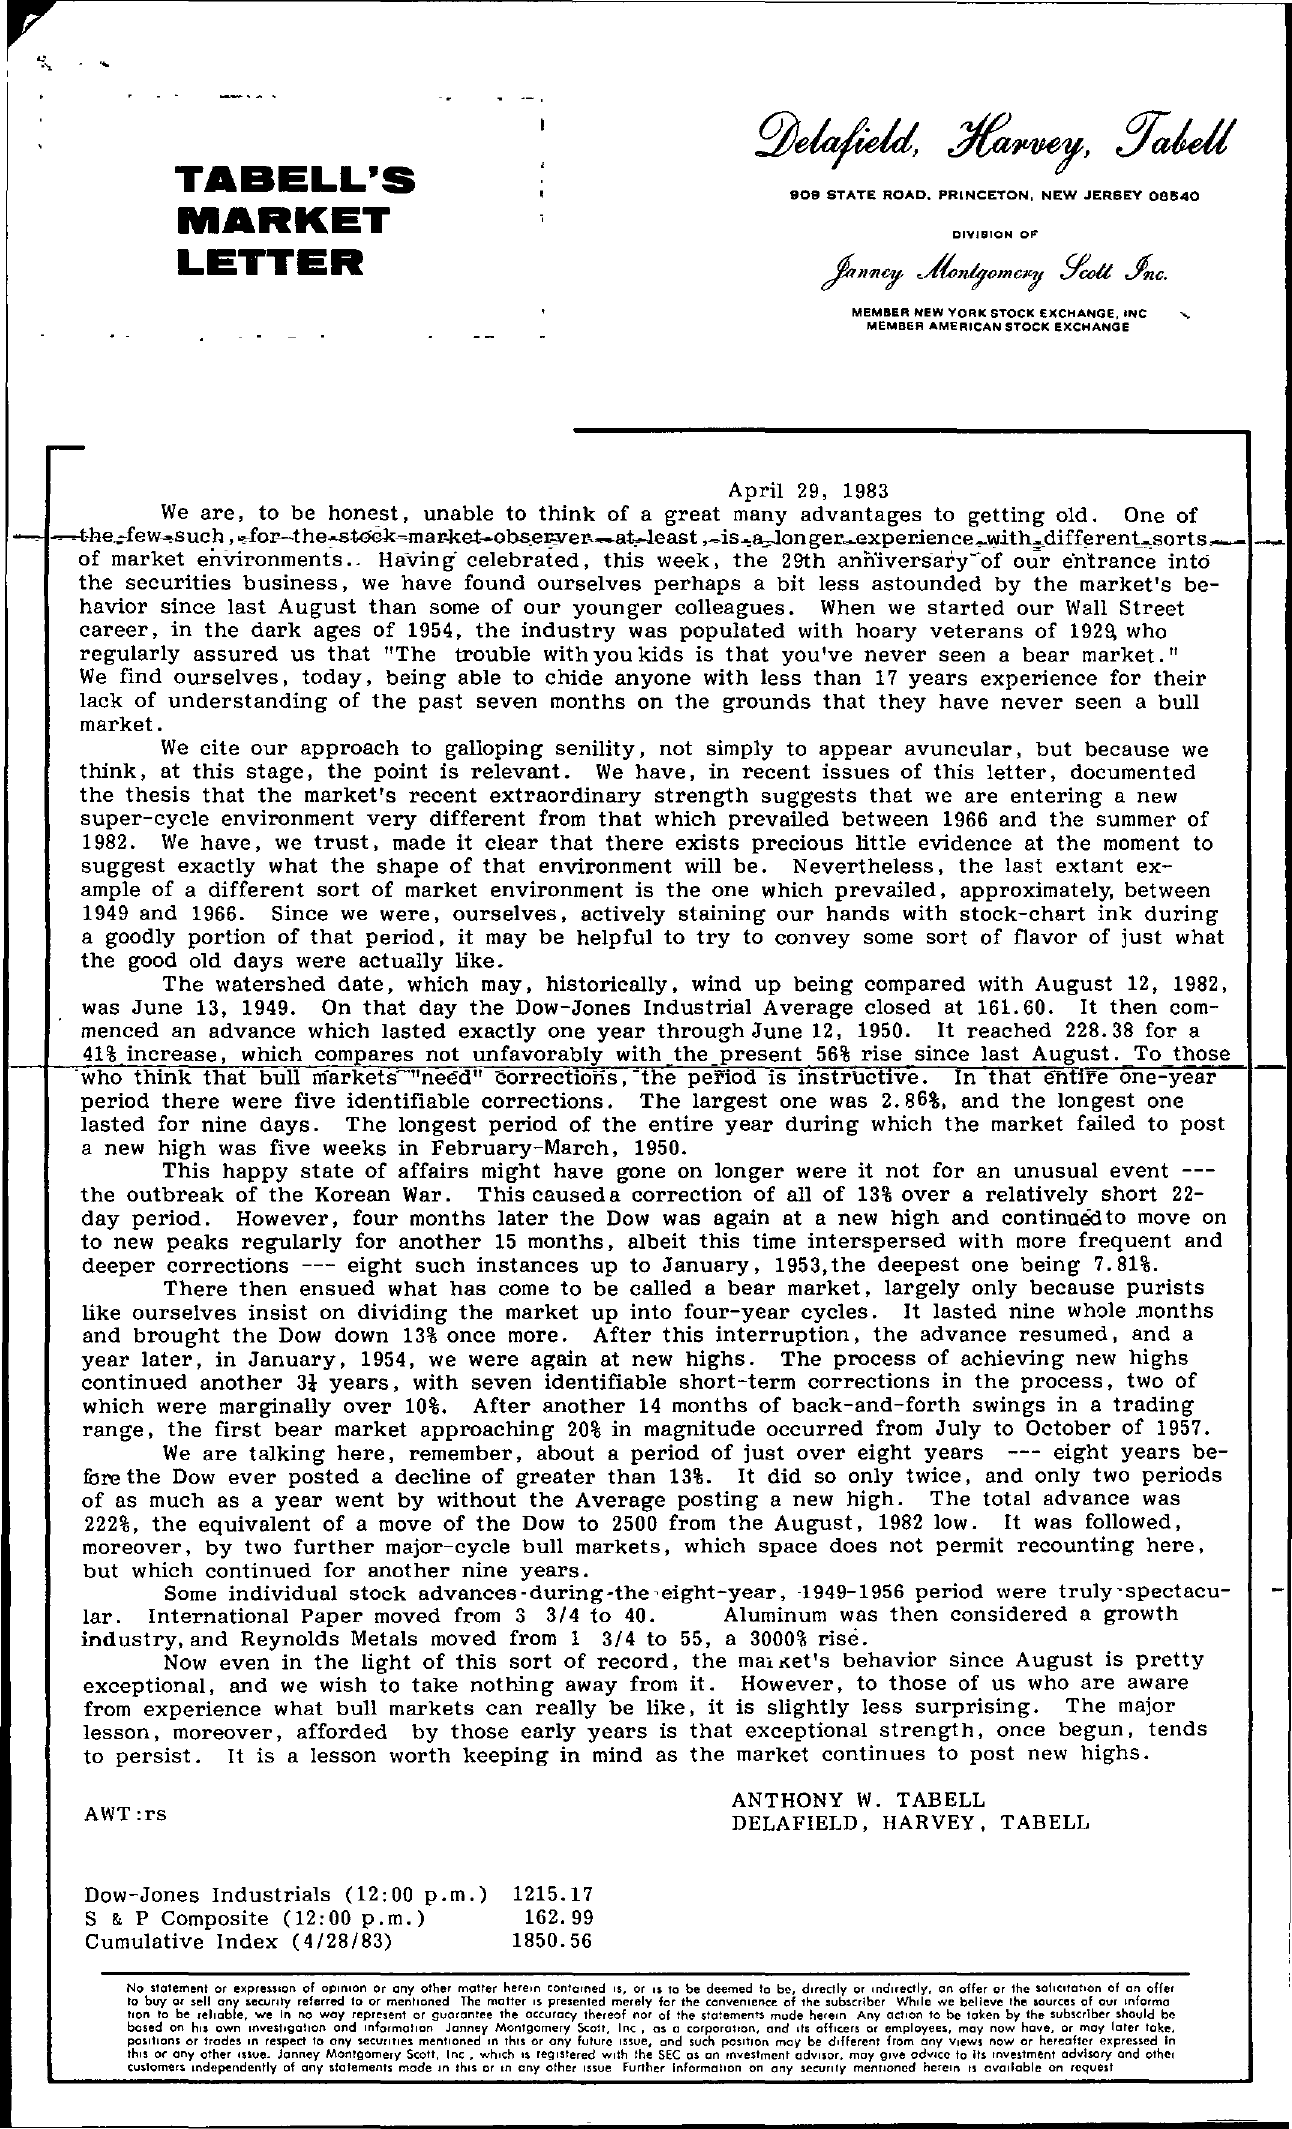 Tabell's Market Letter - April 29, 1983